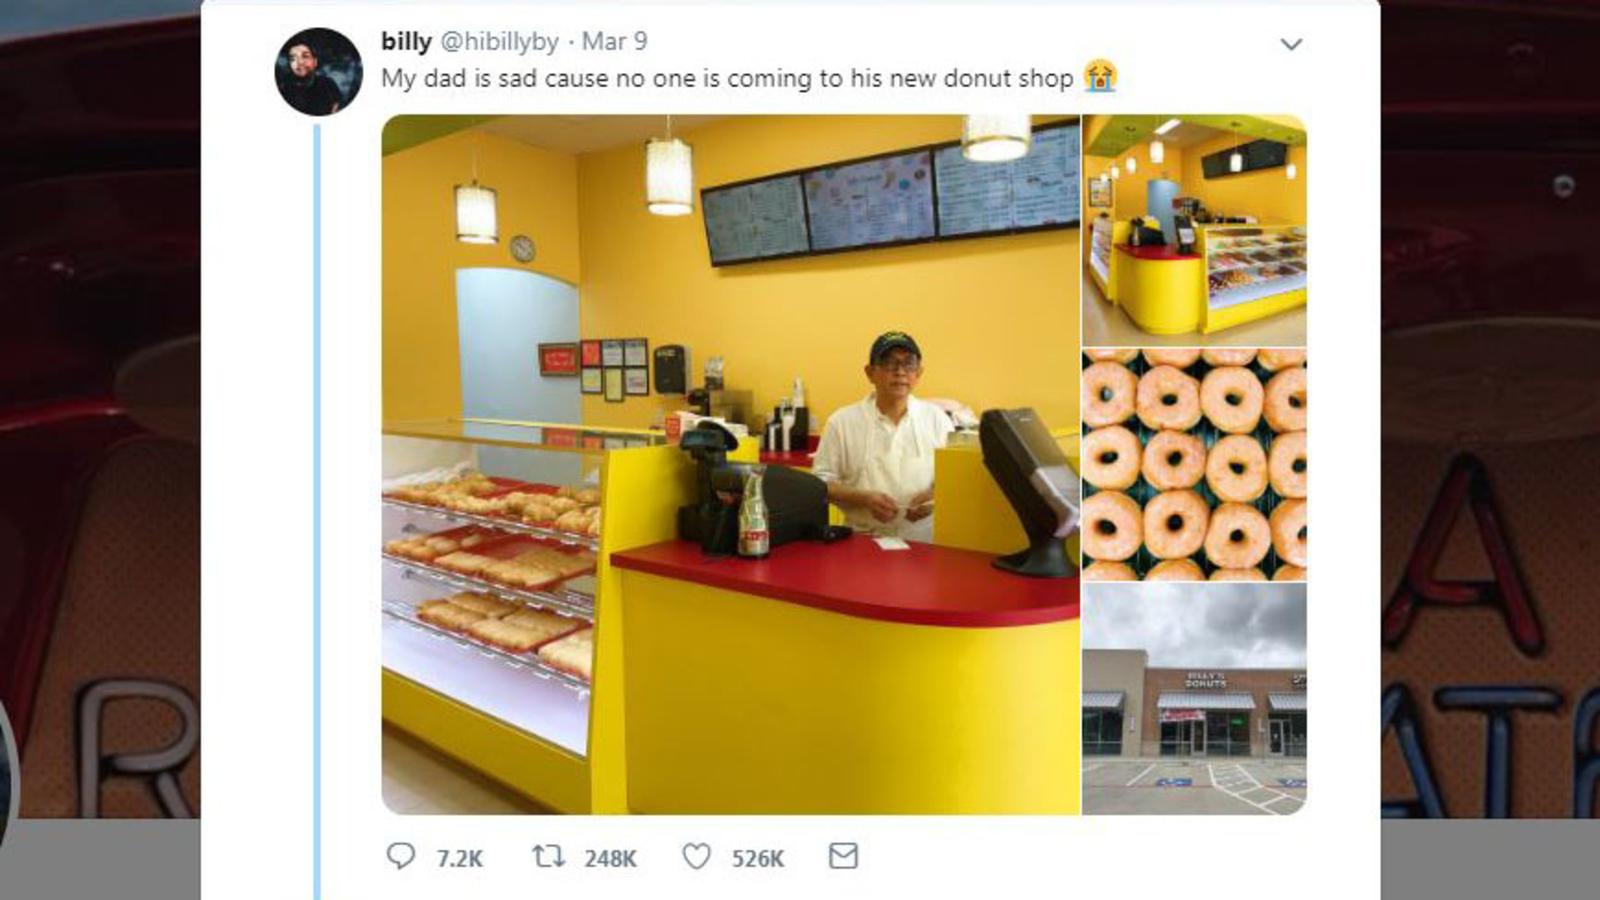 abc13.com: Sad tweet of dad's empty Missouri City doughnut shop goes viral, boosts sales